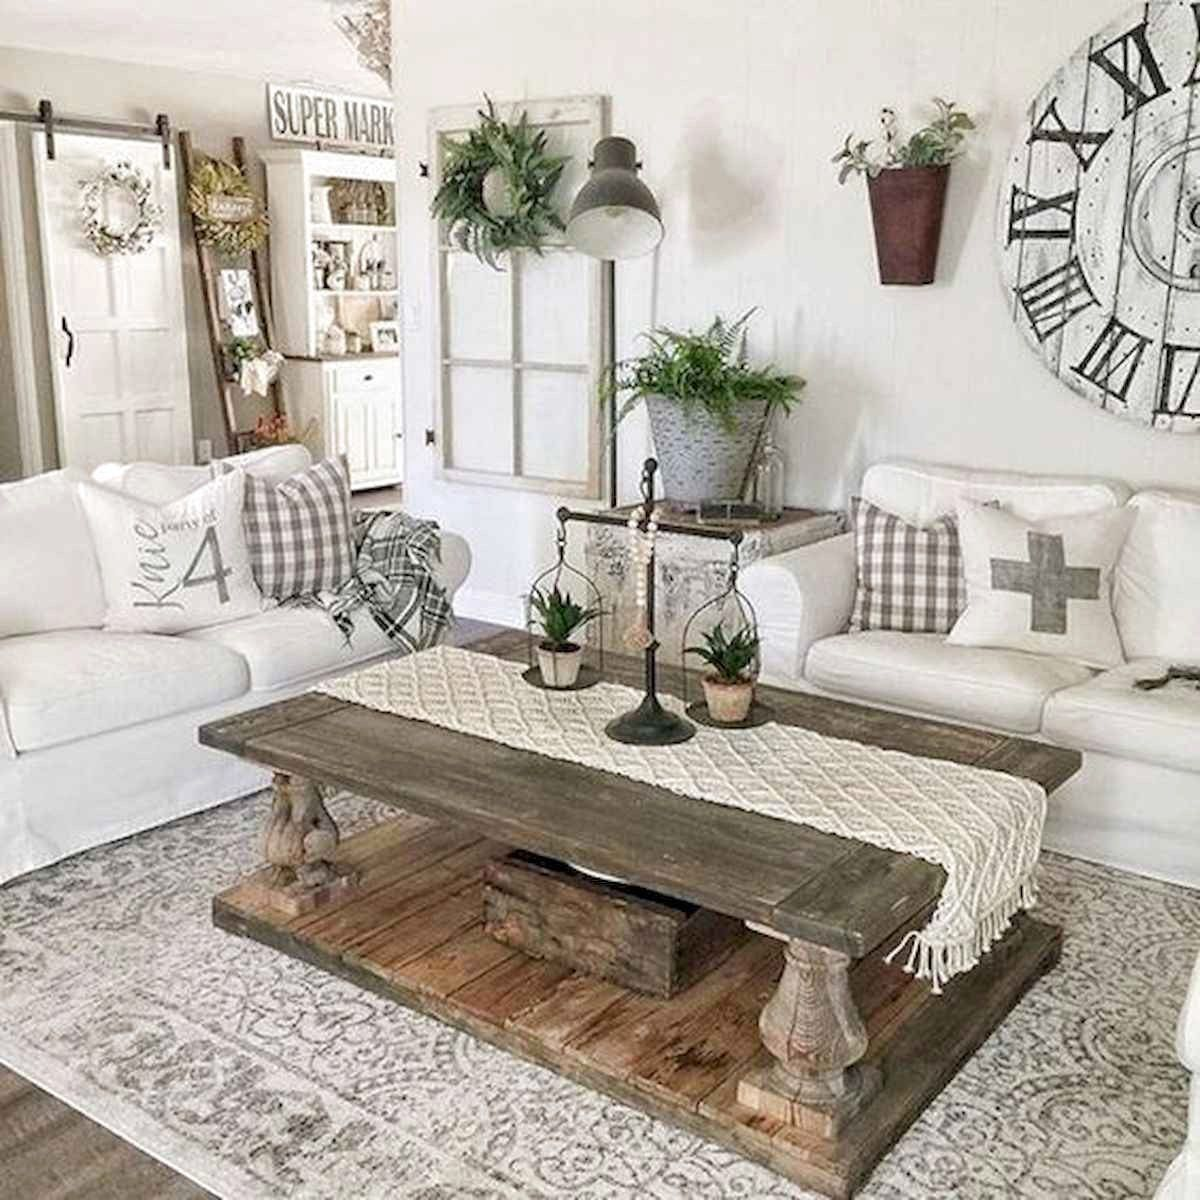 42 favourite modern farmhouse sofa family rooms decor on country farmhouse furniture id=88442